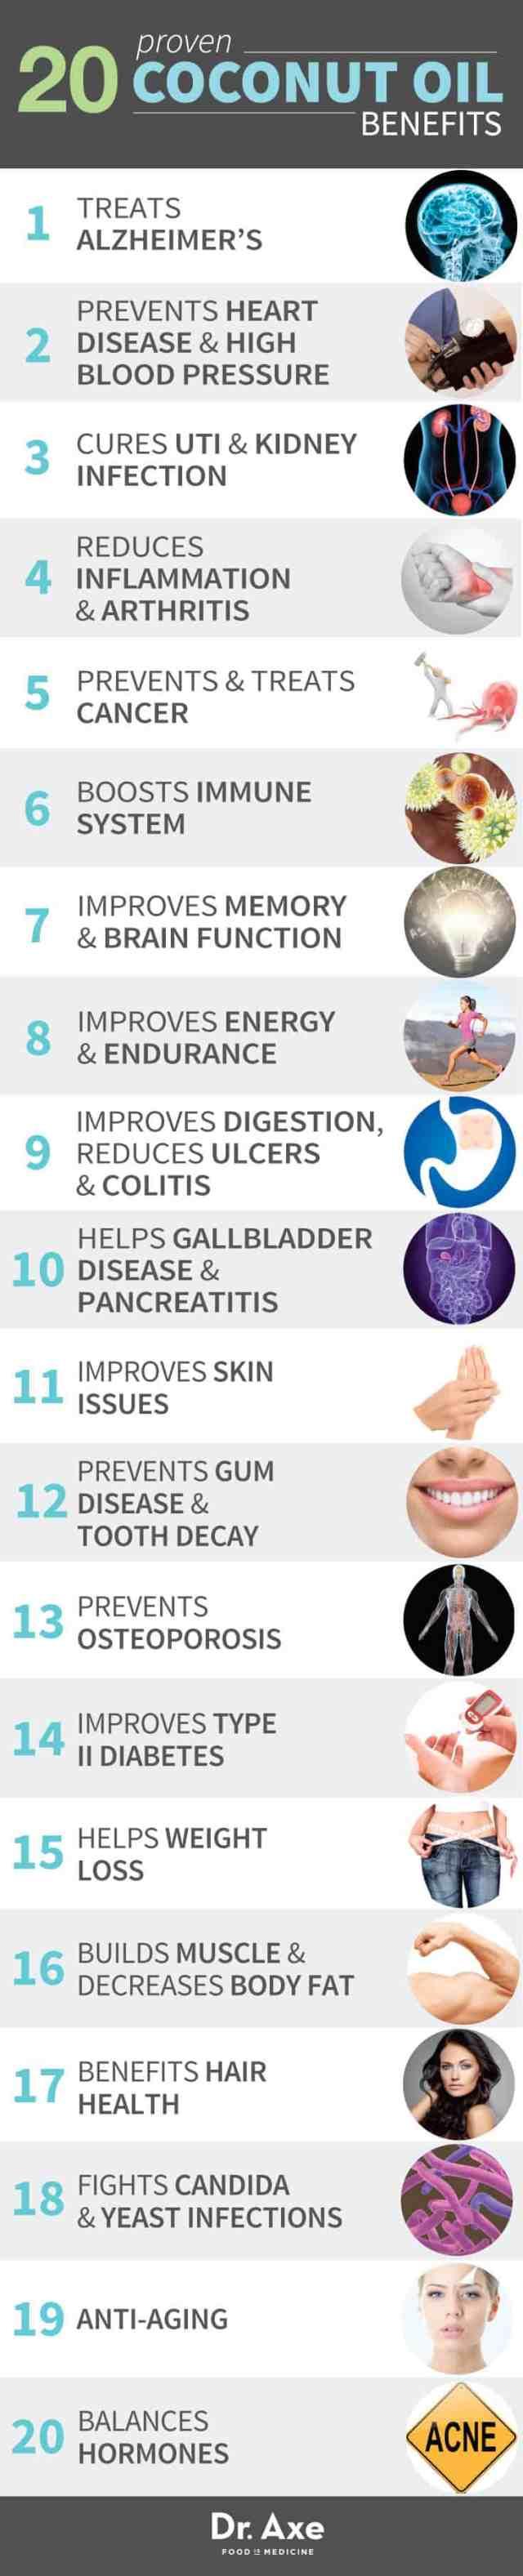 Proven Coconut Oil Health Benefits List infographic